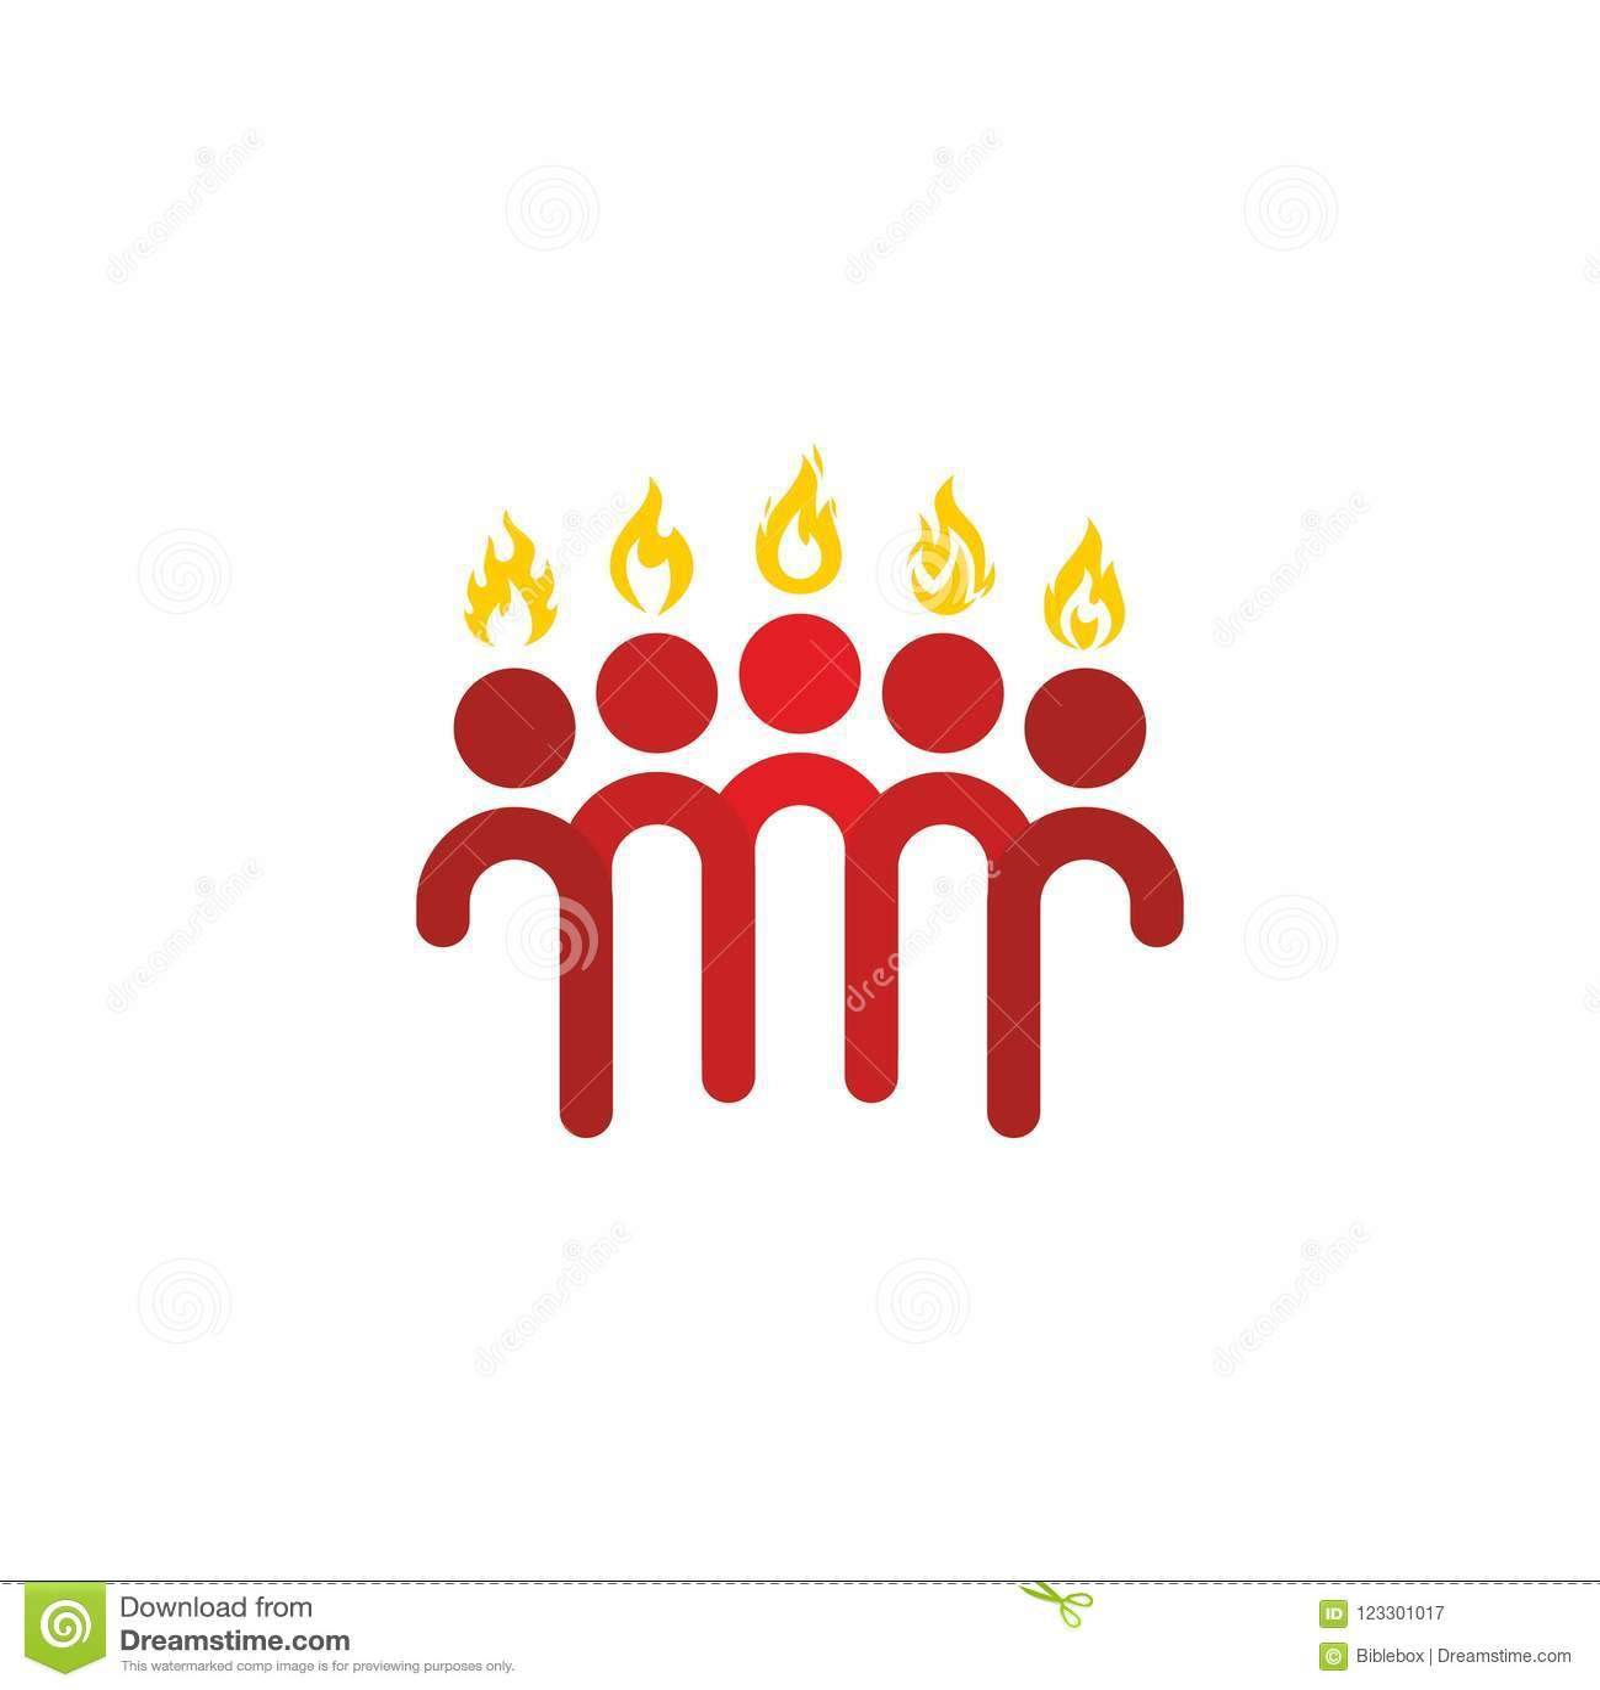 Church Logo Christian Symbols Pentecost The Apostles And Flames